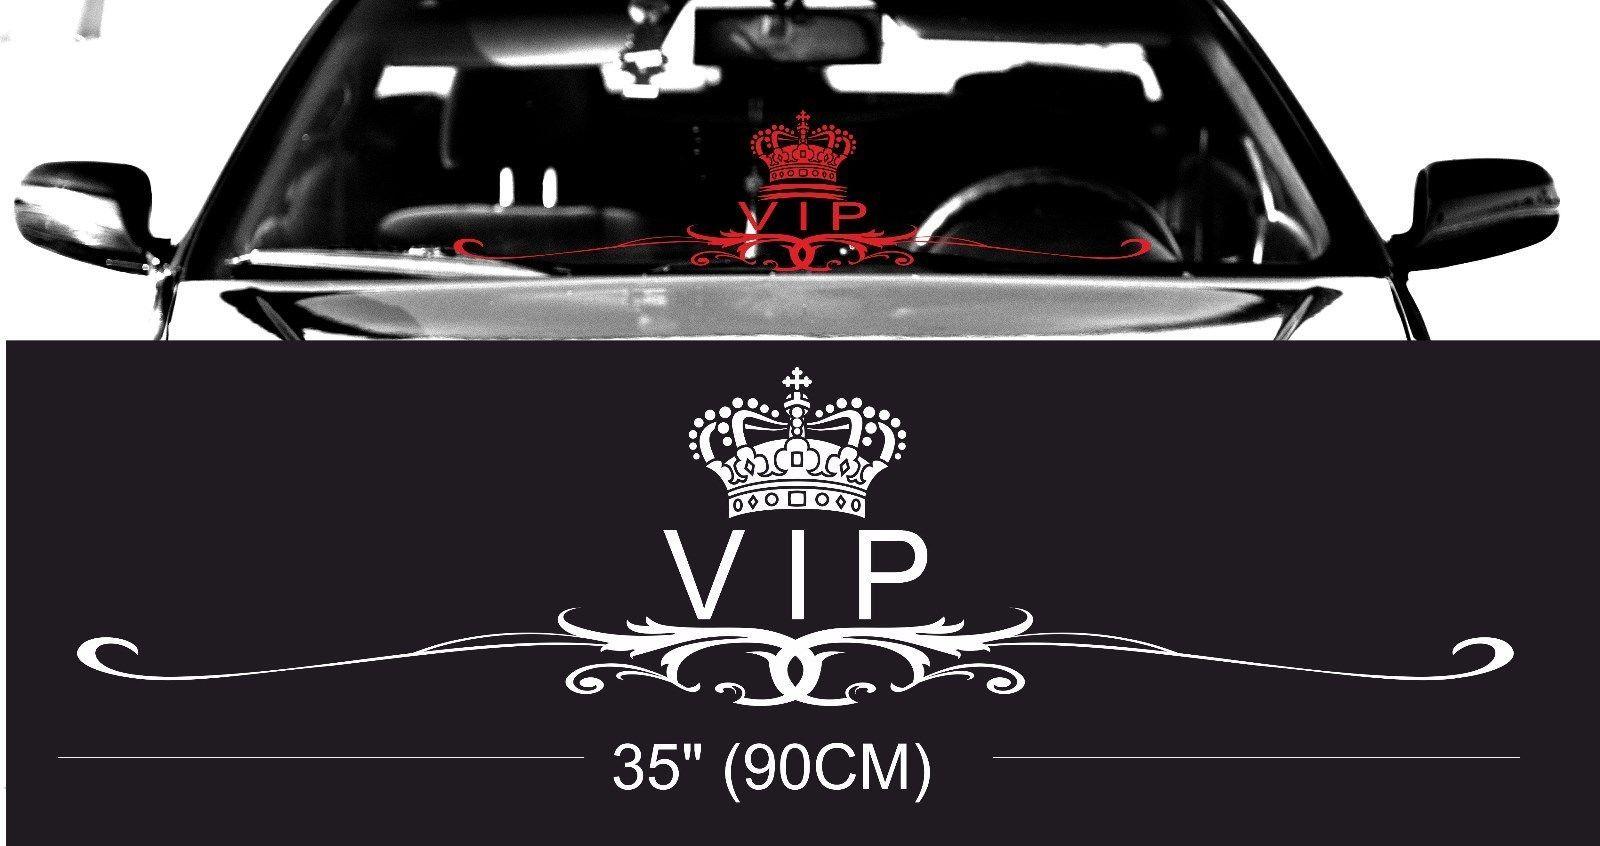 Royal Vip Classy Windshield Windscreen Front Glass Car Jdm Decal Sticker Windshield Wind Screen Interior Accessories [ 846 x 1600 Pixel ]